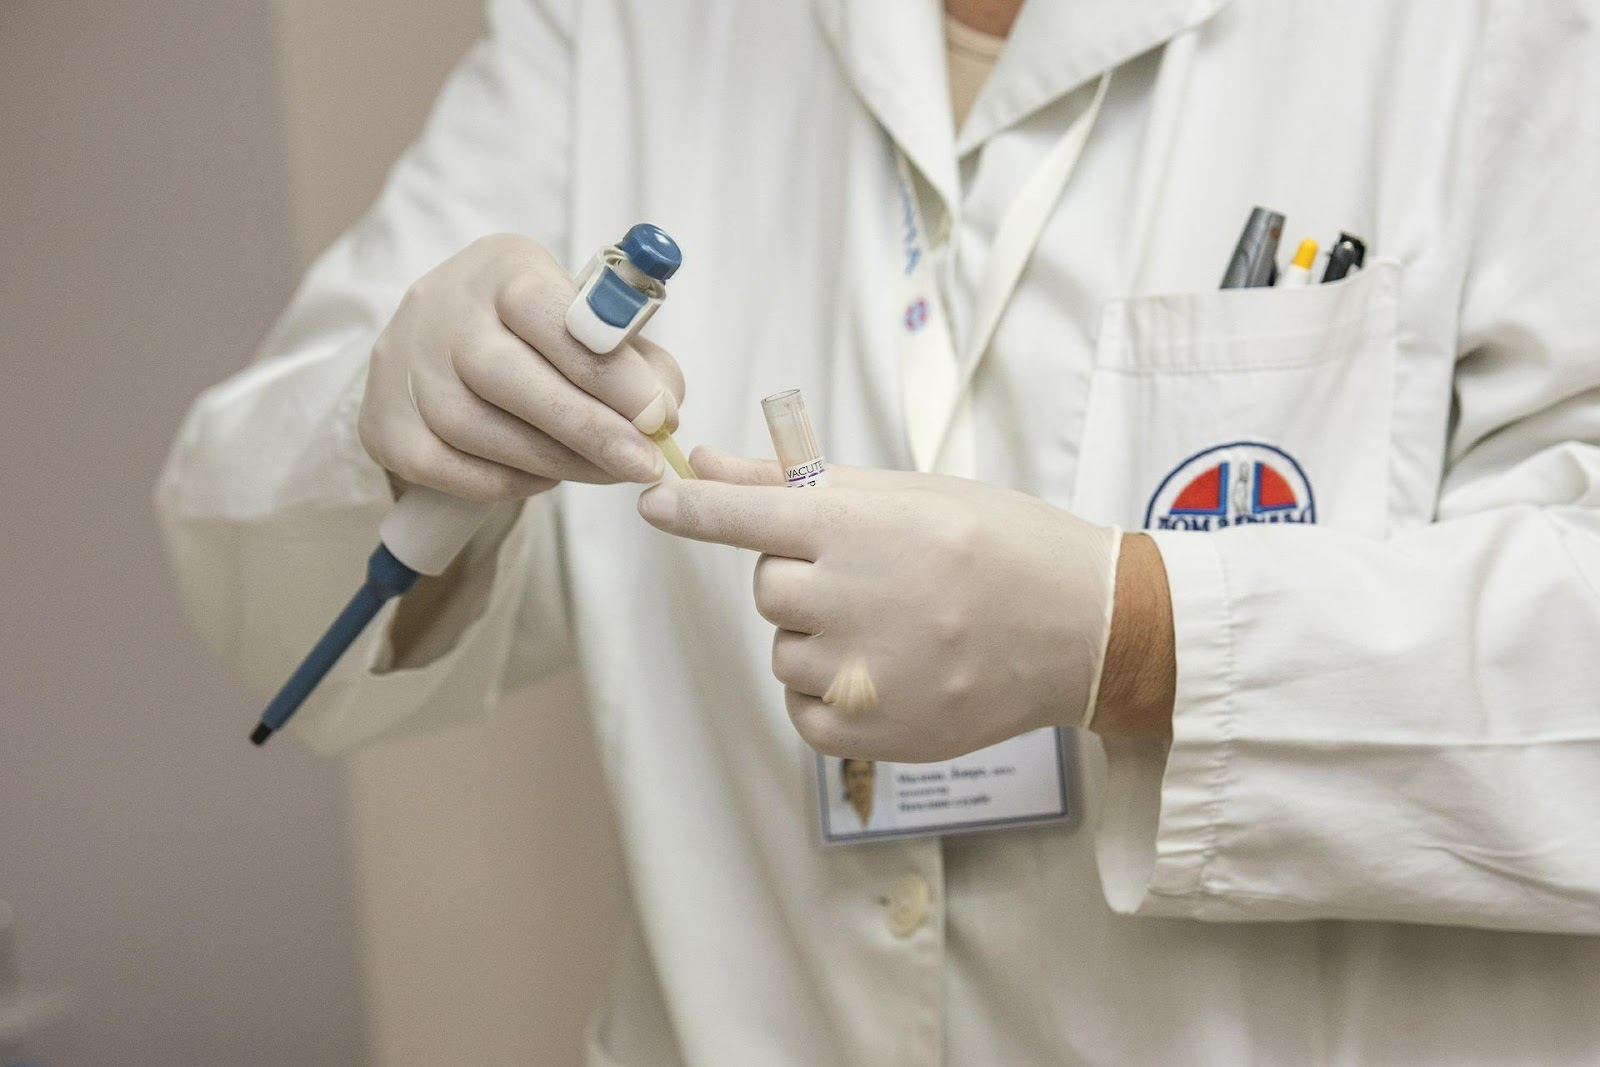 A medical professional handling hazardous materials